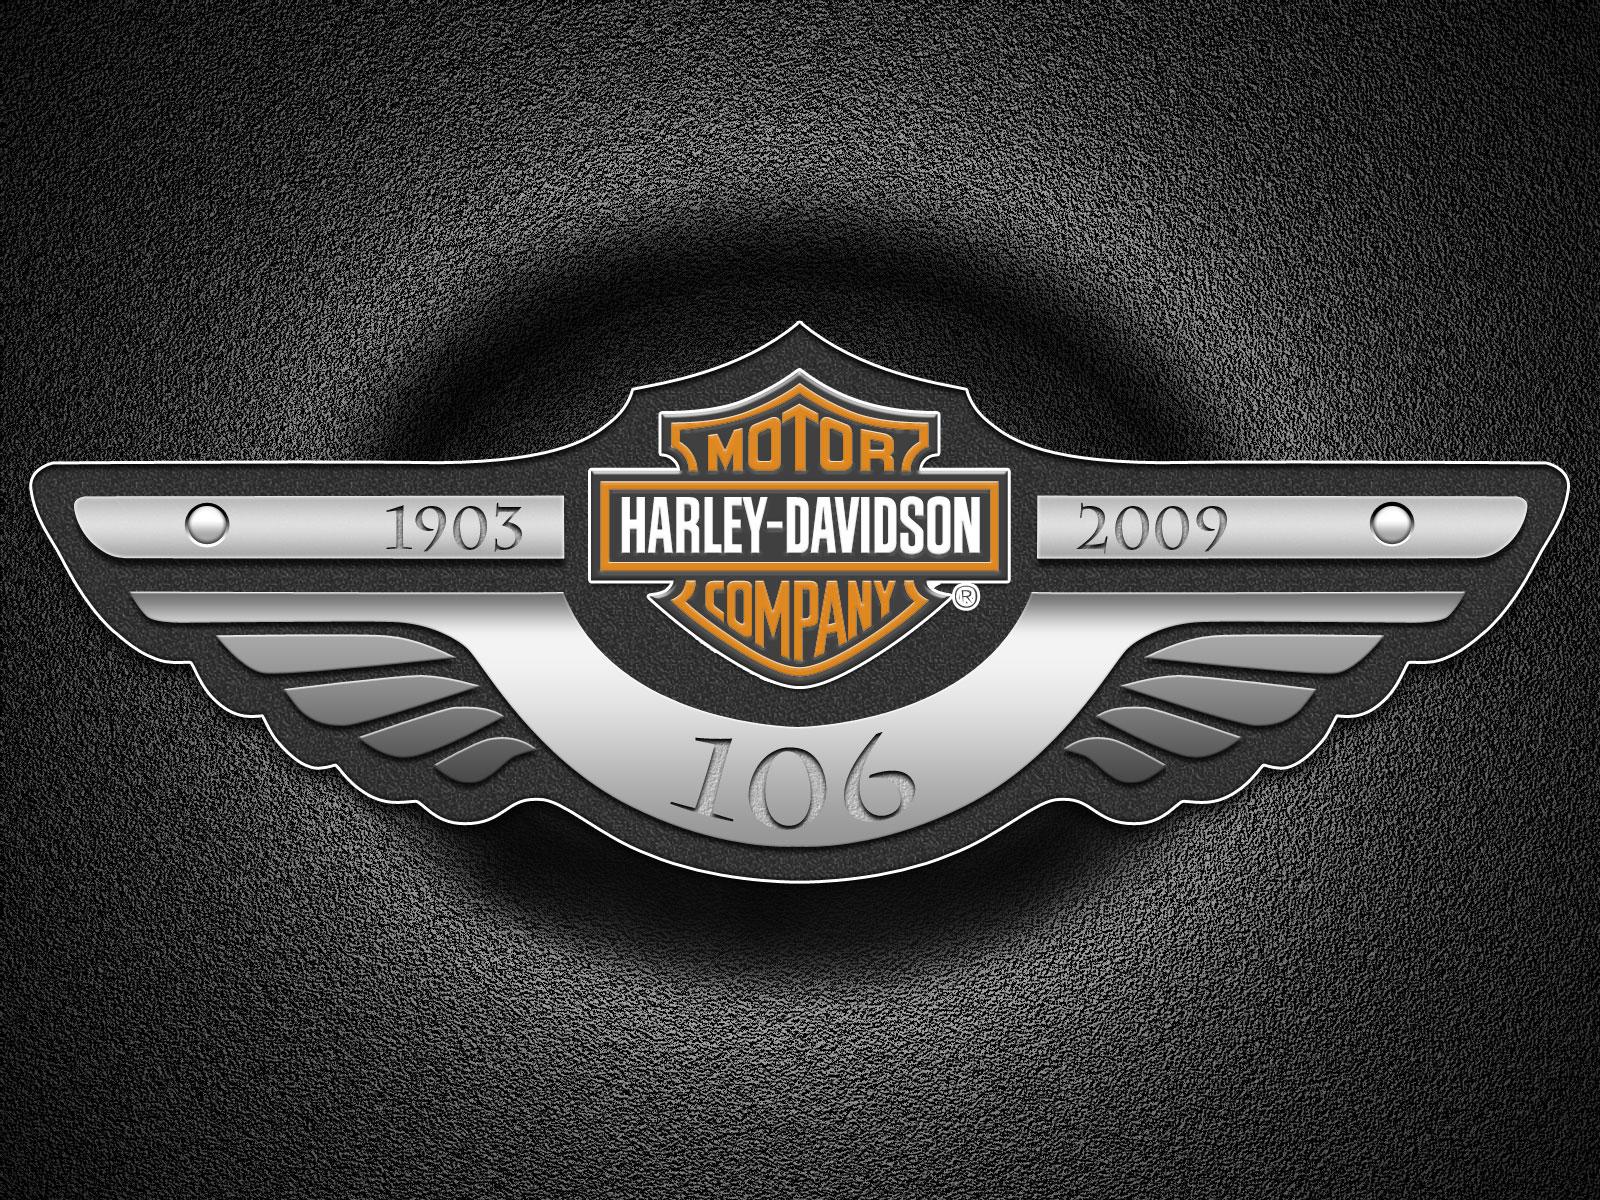 Harley Davidson Logo Click To View